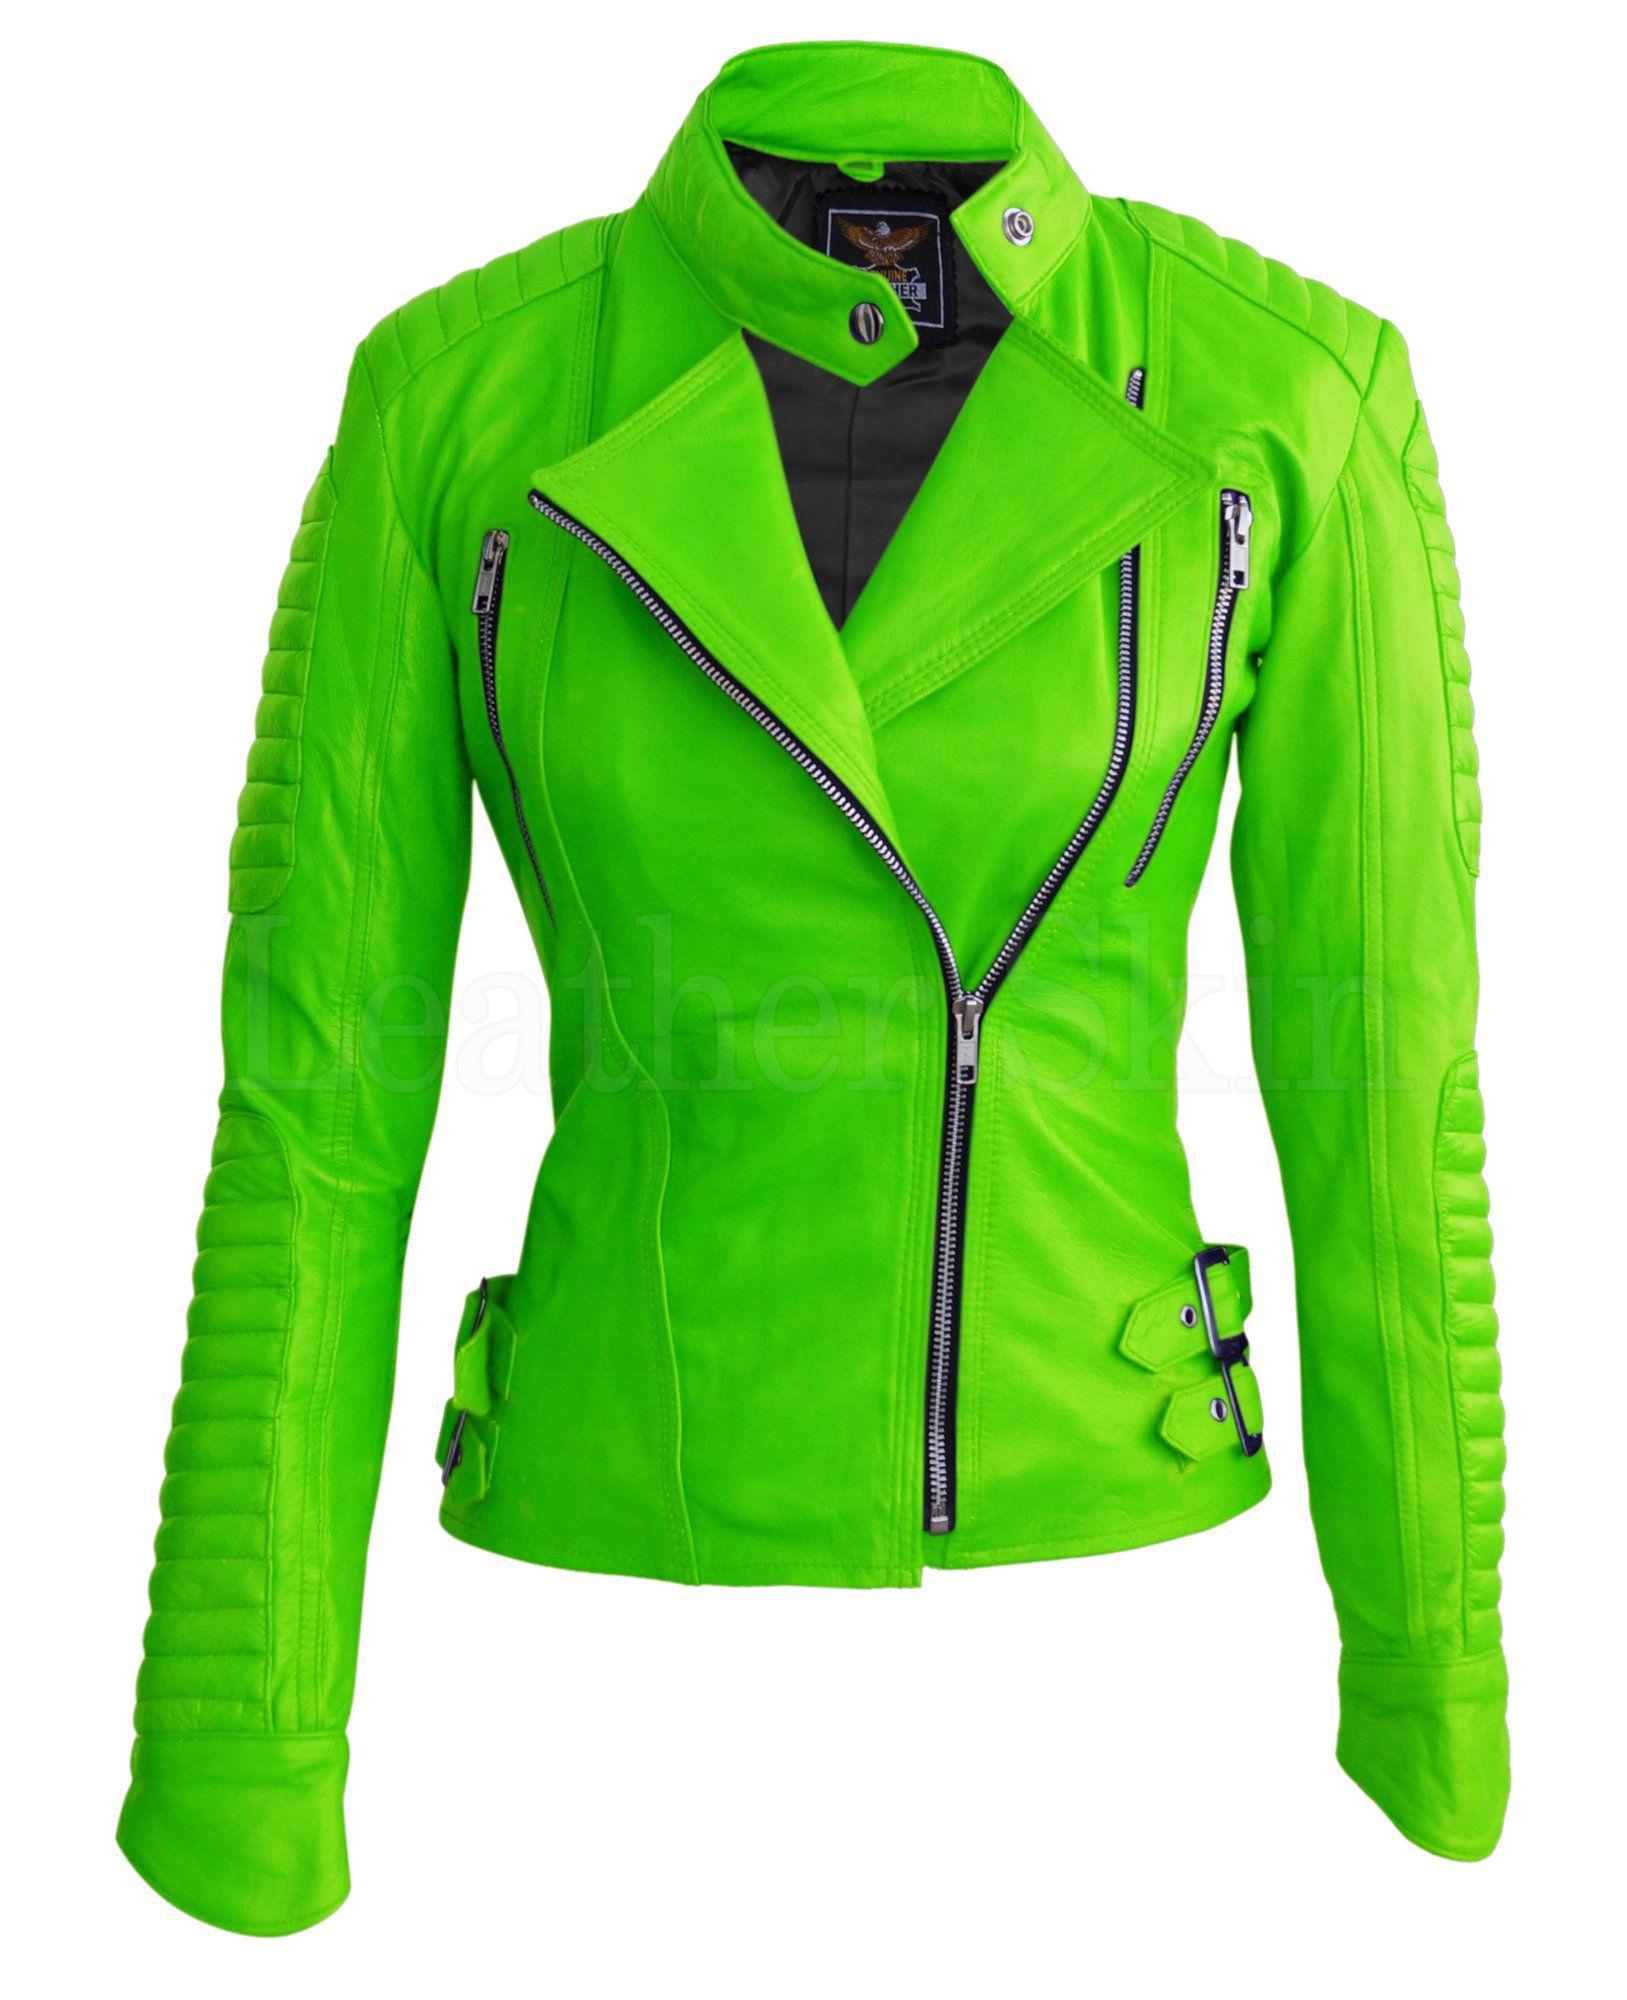 Leather Skin Women Parrot Green Brando Shoulder Padded Genuine Leather Jacket Leather Jackets Women Green Leather Jackets Jackets For Women [ 2000 x 1627 Pixel ]